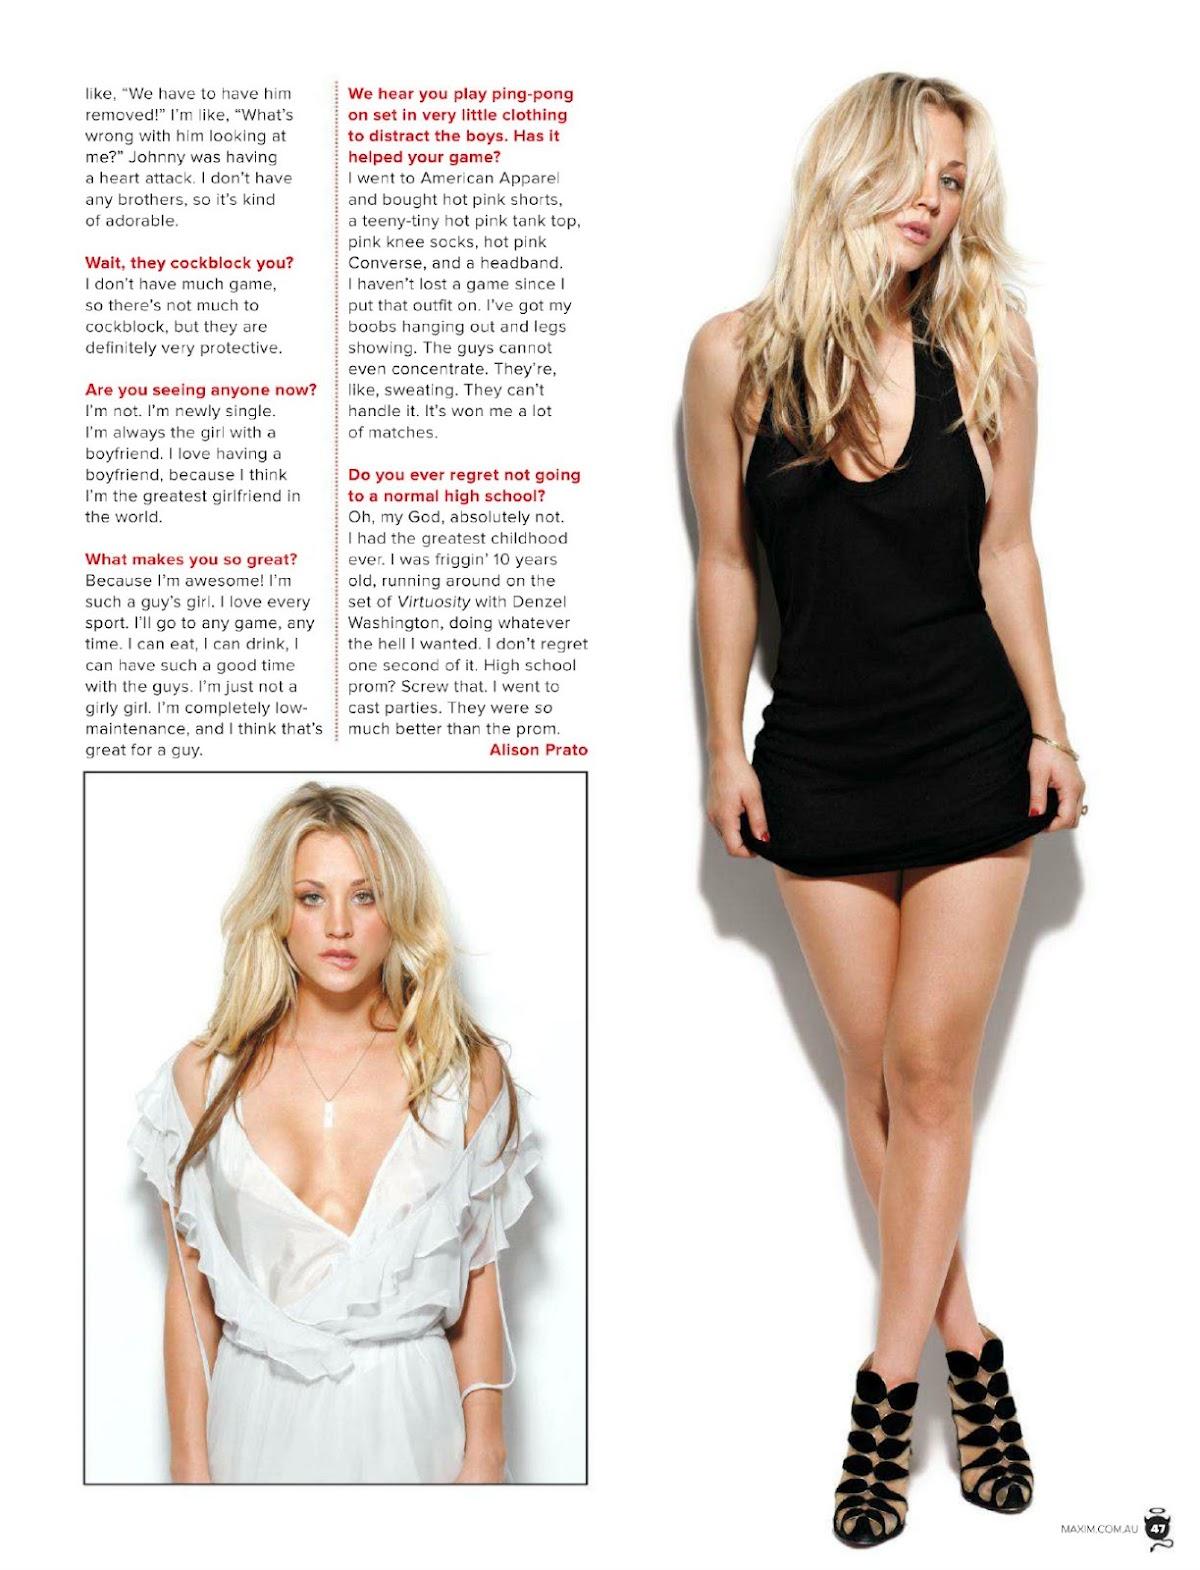 http://3.bp.blogspot.com/-ANMRjJqWfec/T-cXJMFY8EI/AAAAAAAAFGo/bObOdWi6PvQ/s1570/Kaley+Cuoco+-+Maxim+magazine+Australia+July+2012+09.jpg